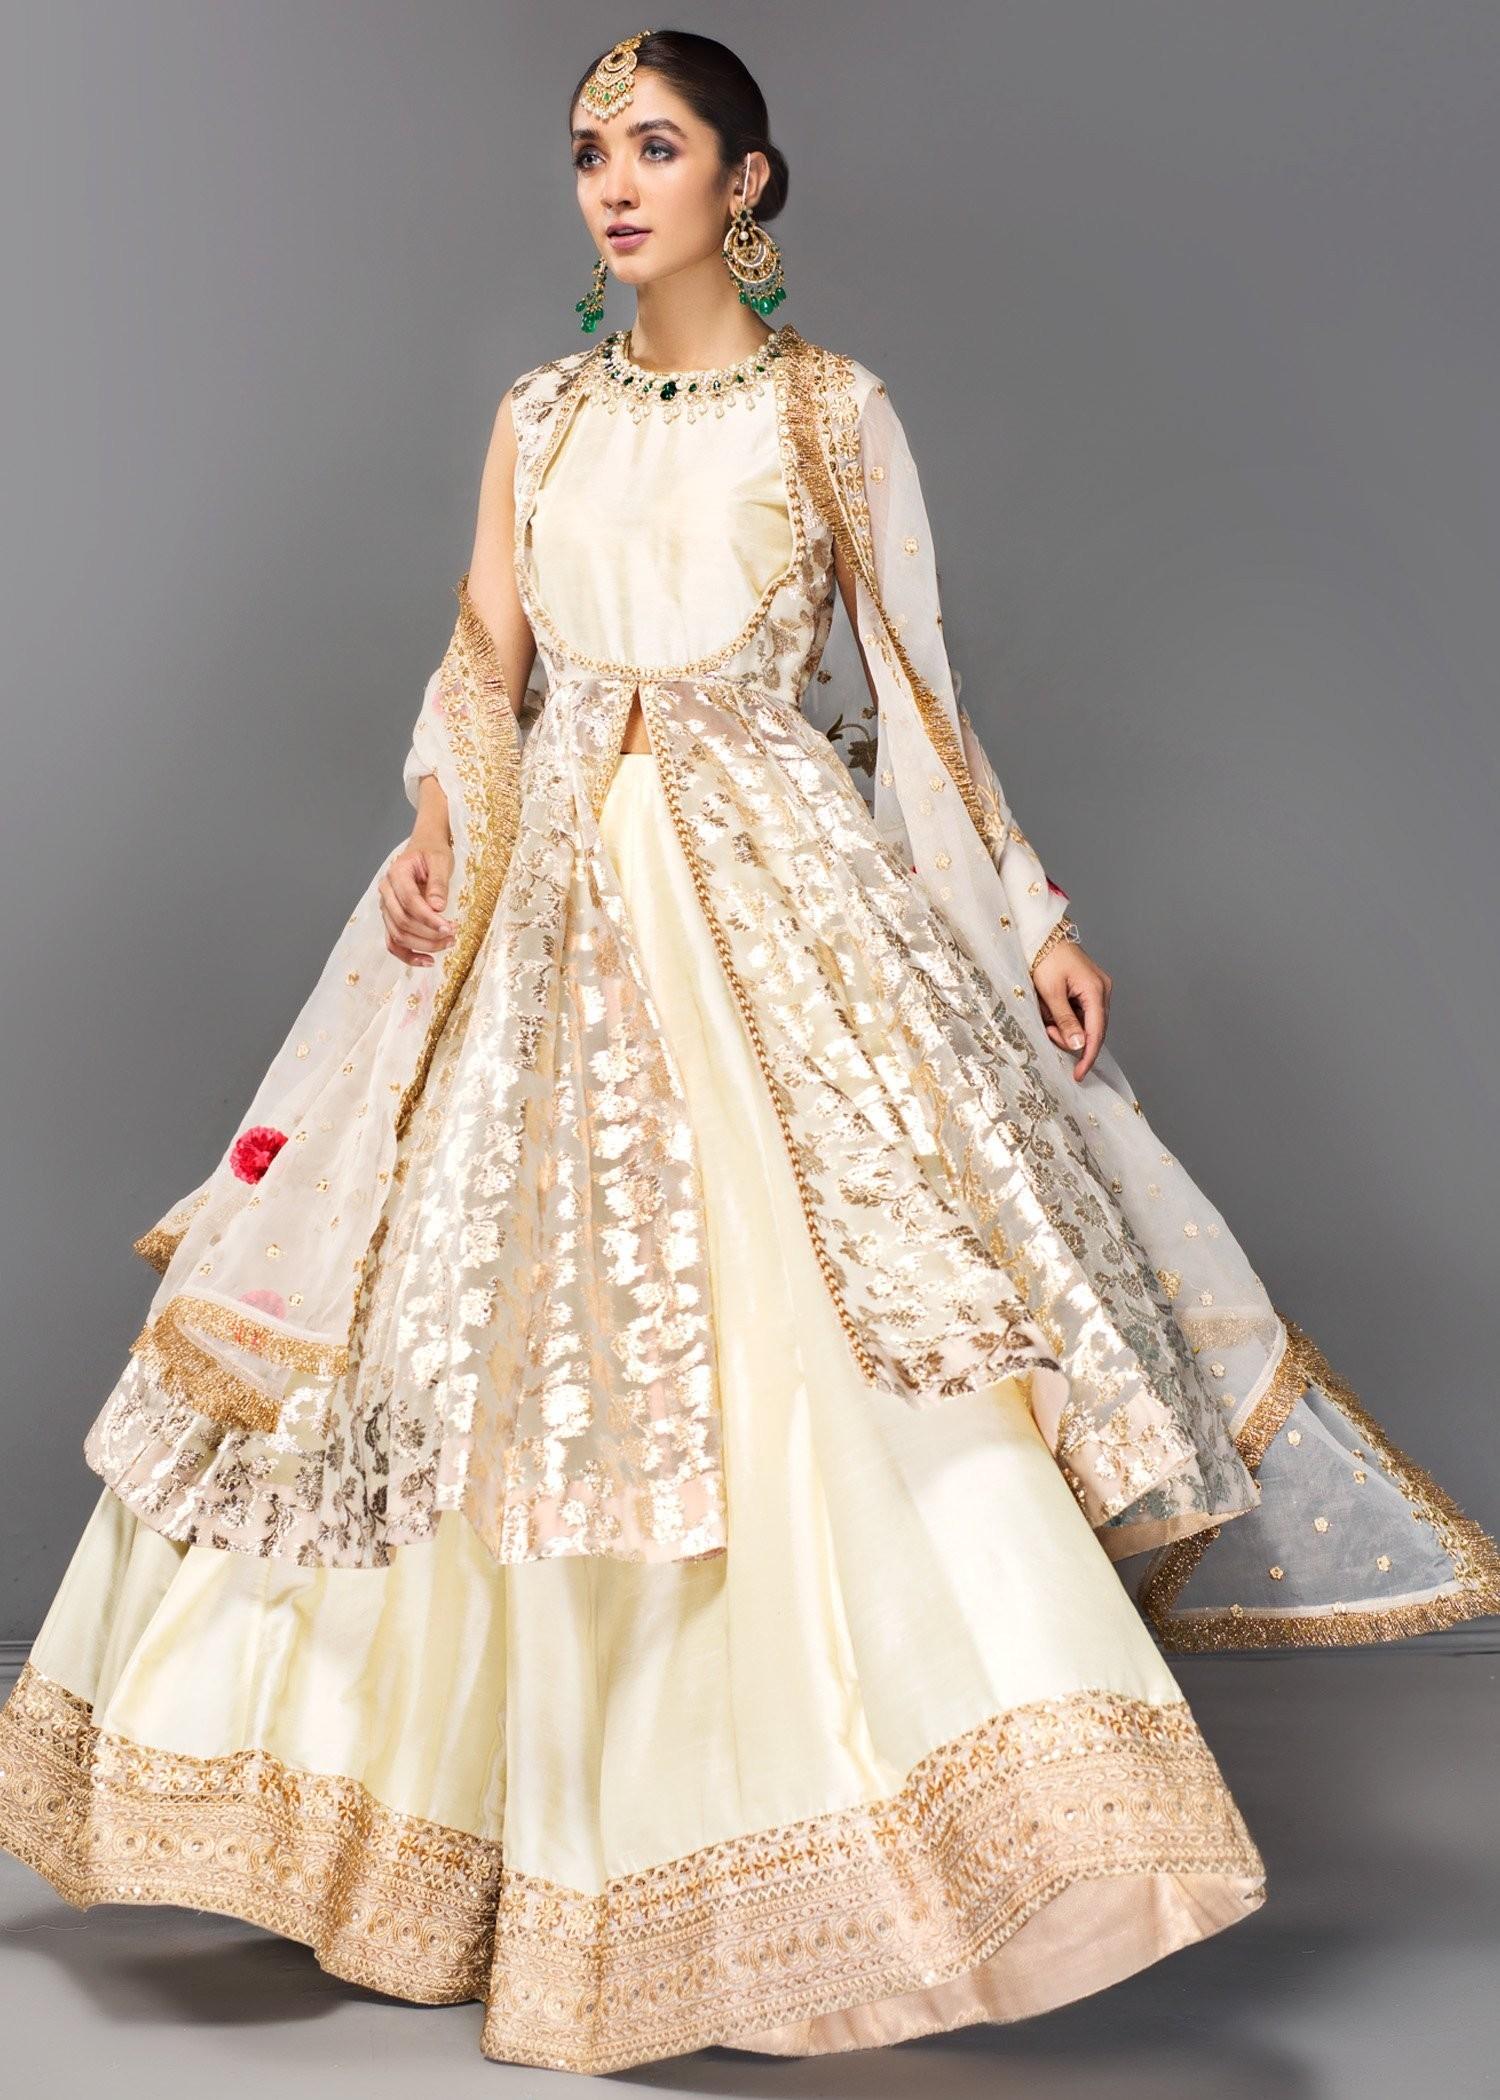 Anarkali-wedding dress